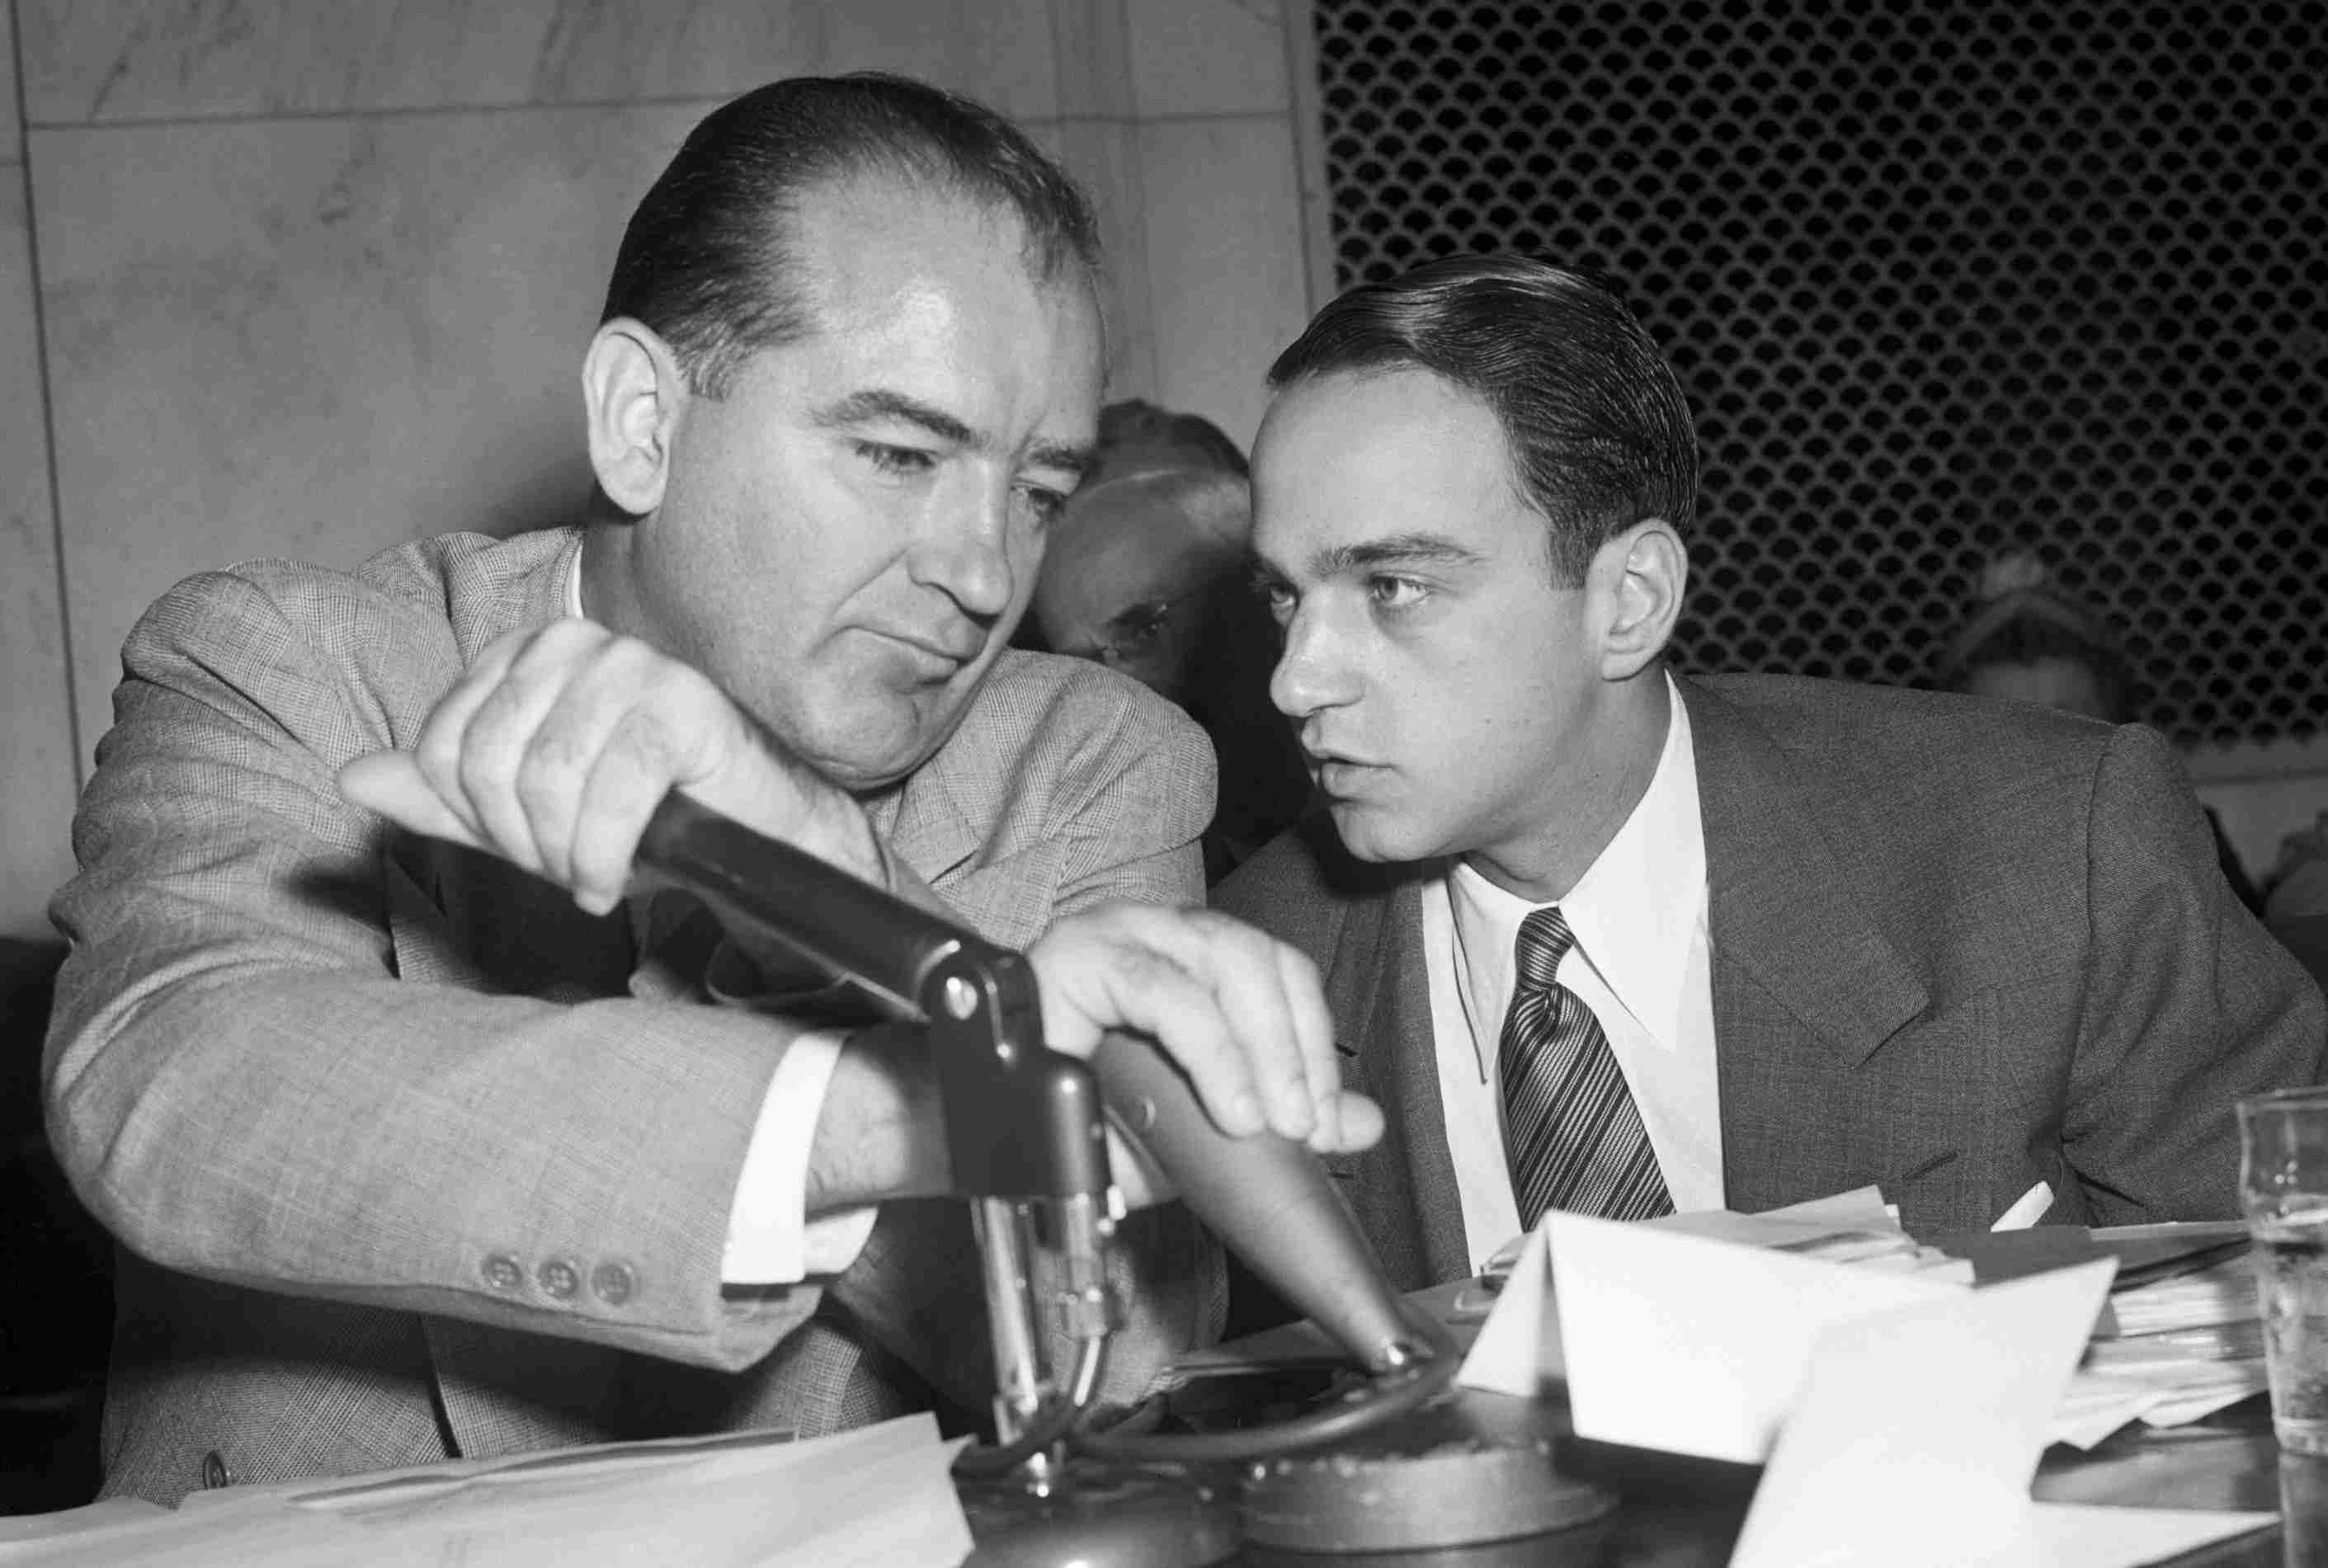 Photograph of Joseph McCarthy and Roy Cohn